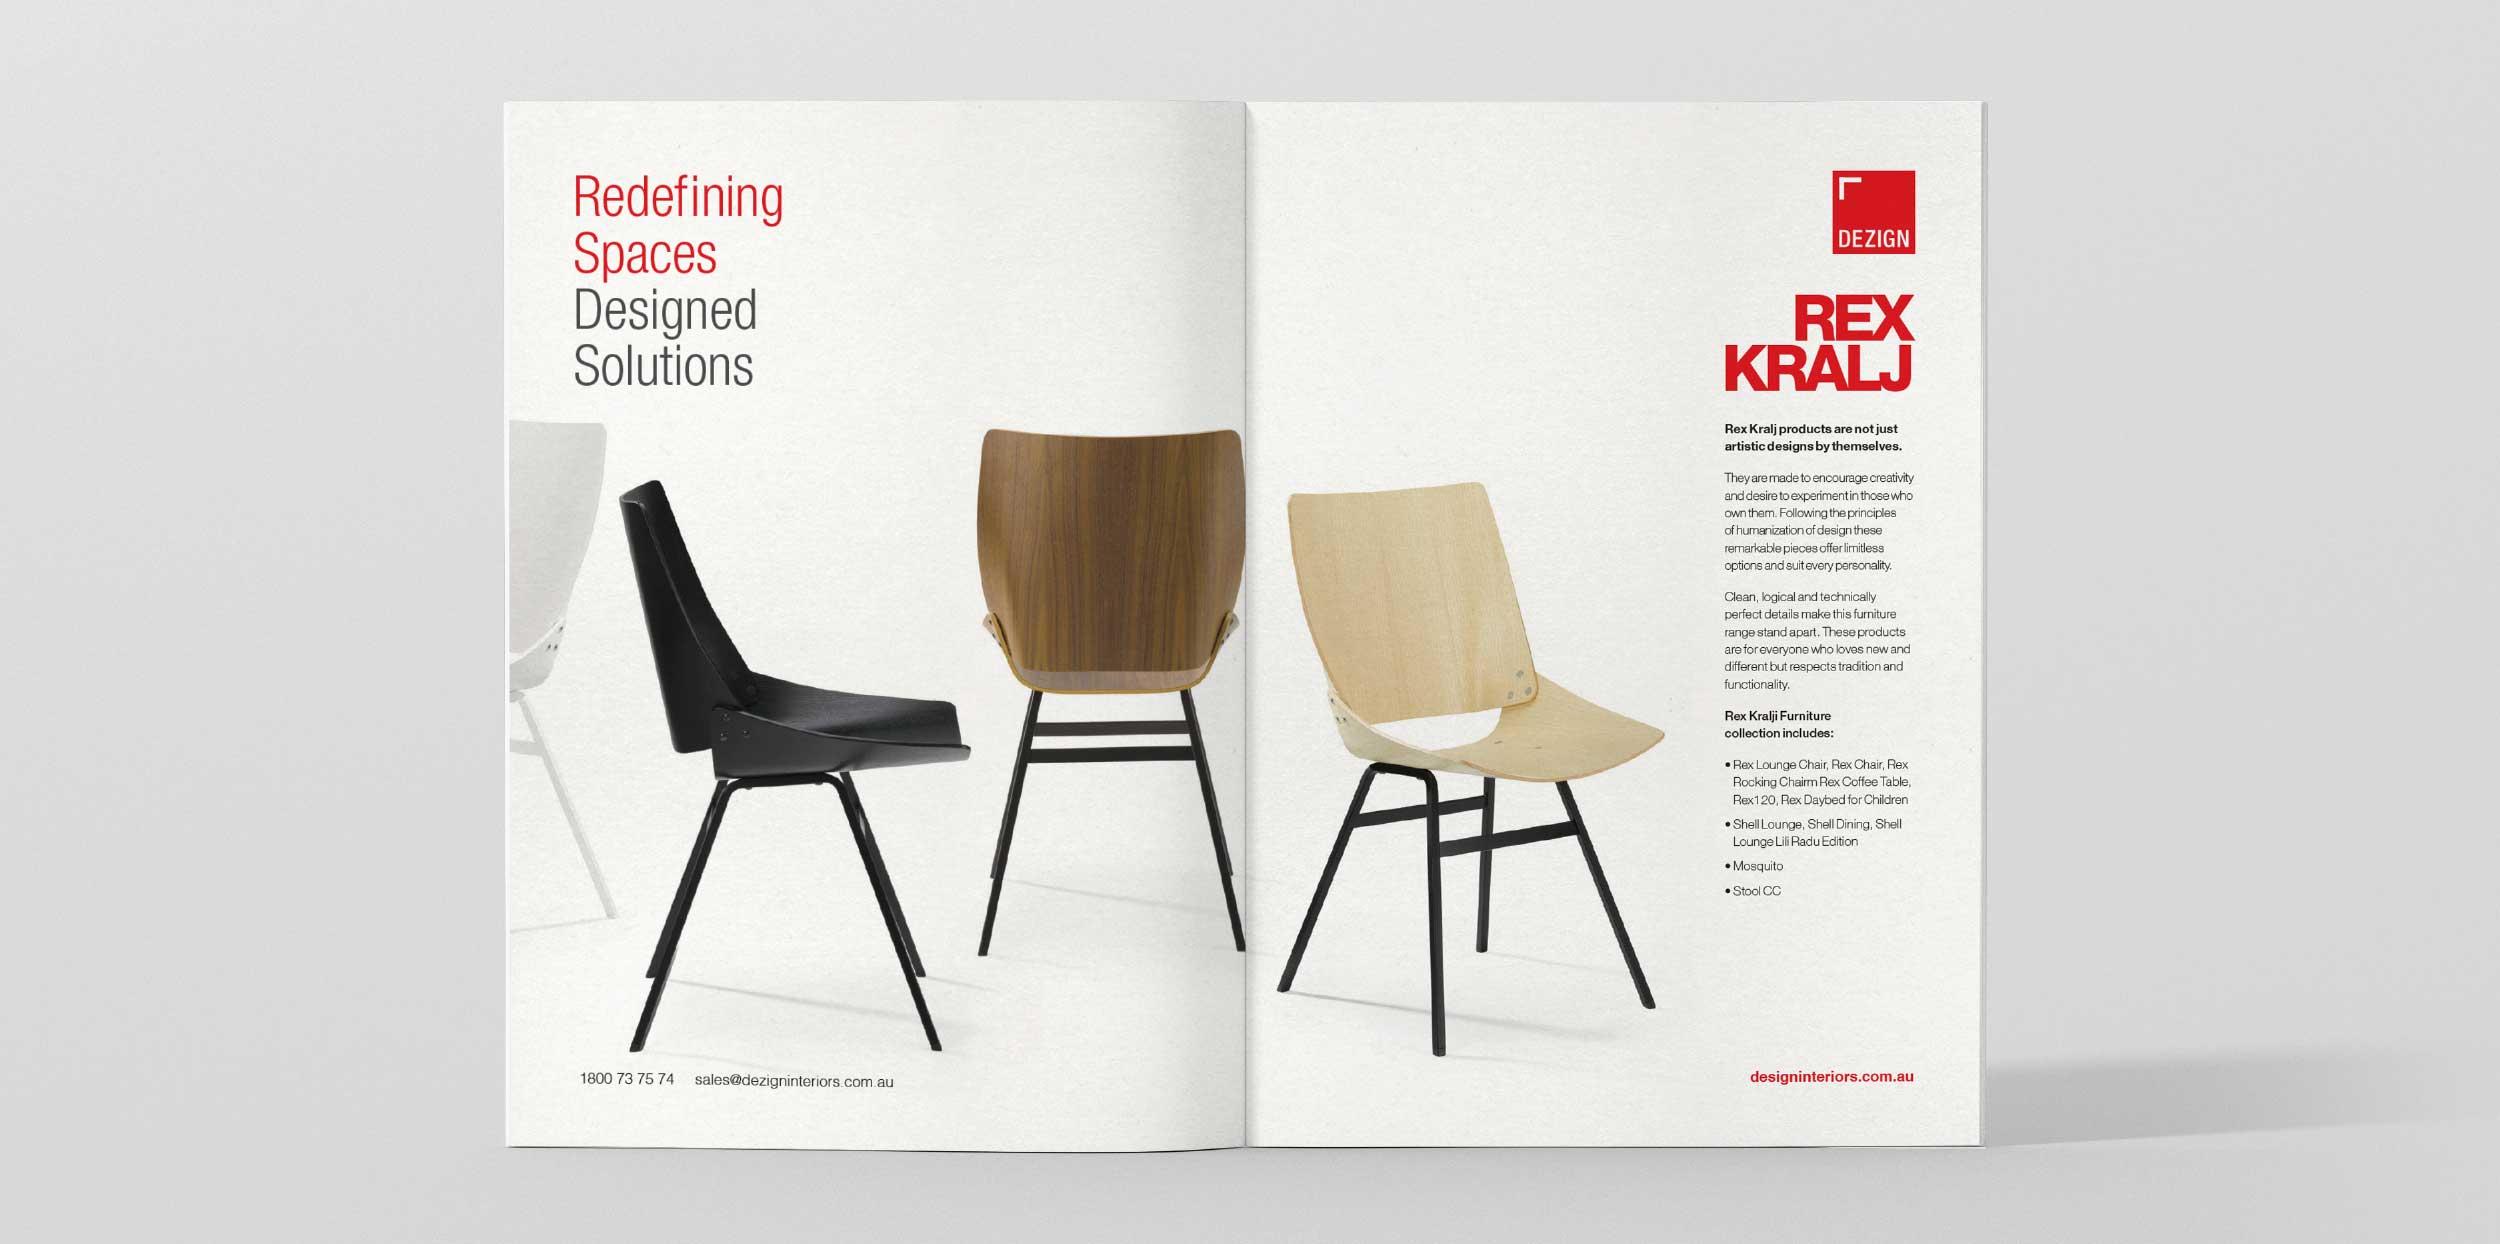 Handle-Sydney-Branding_Dezign-Interiors-Image-03.jpg